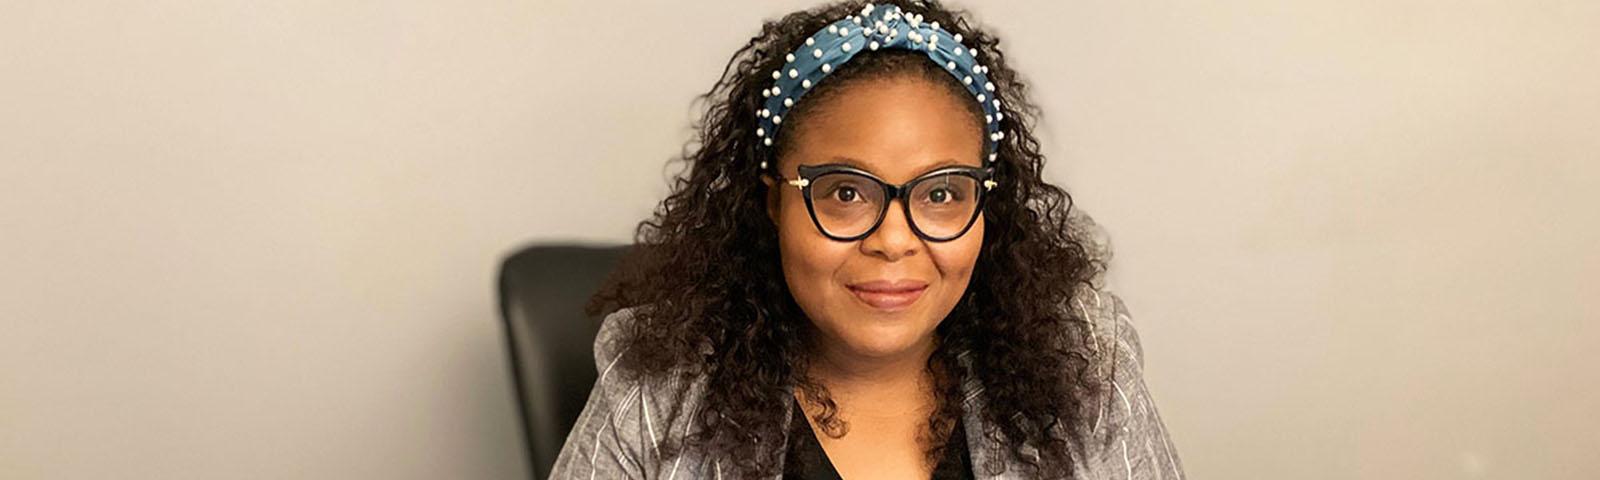 Jameeta, Team Member Communications & Engagement Director